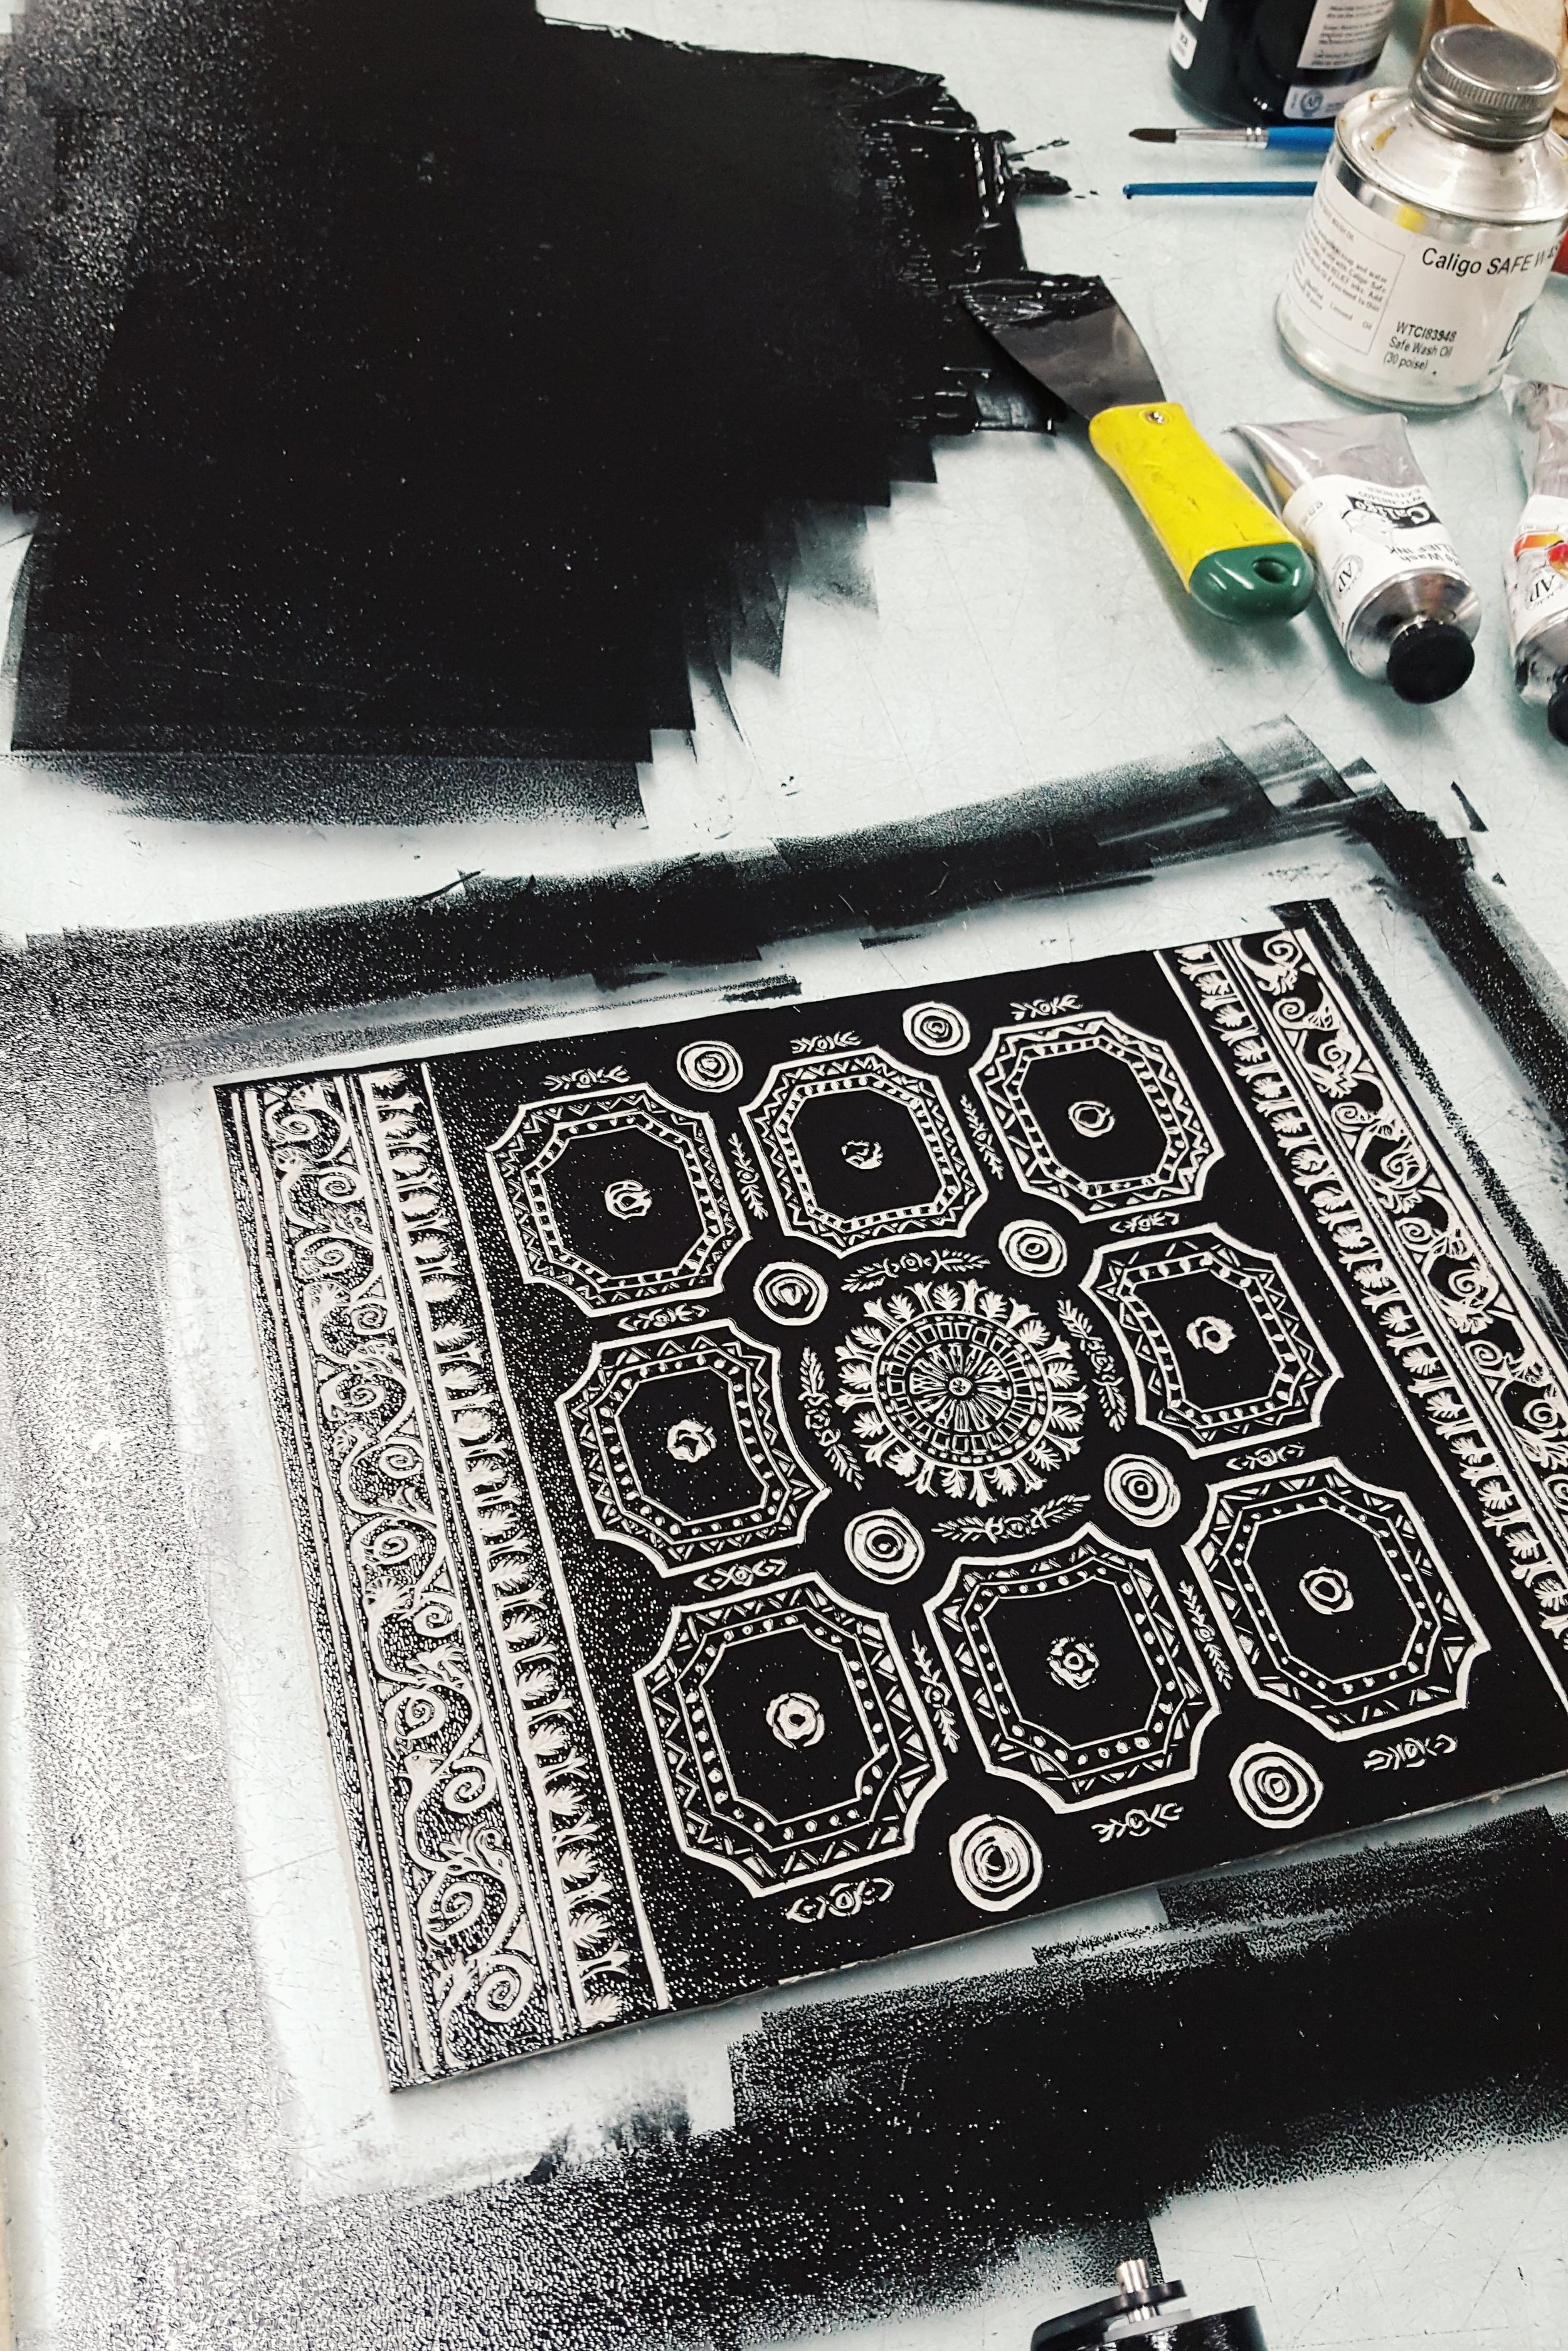 Printing a linocut